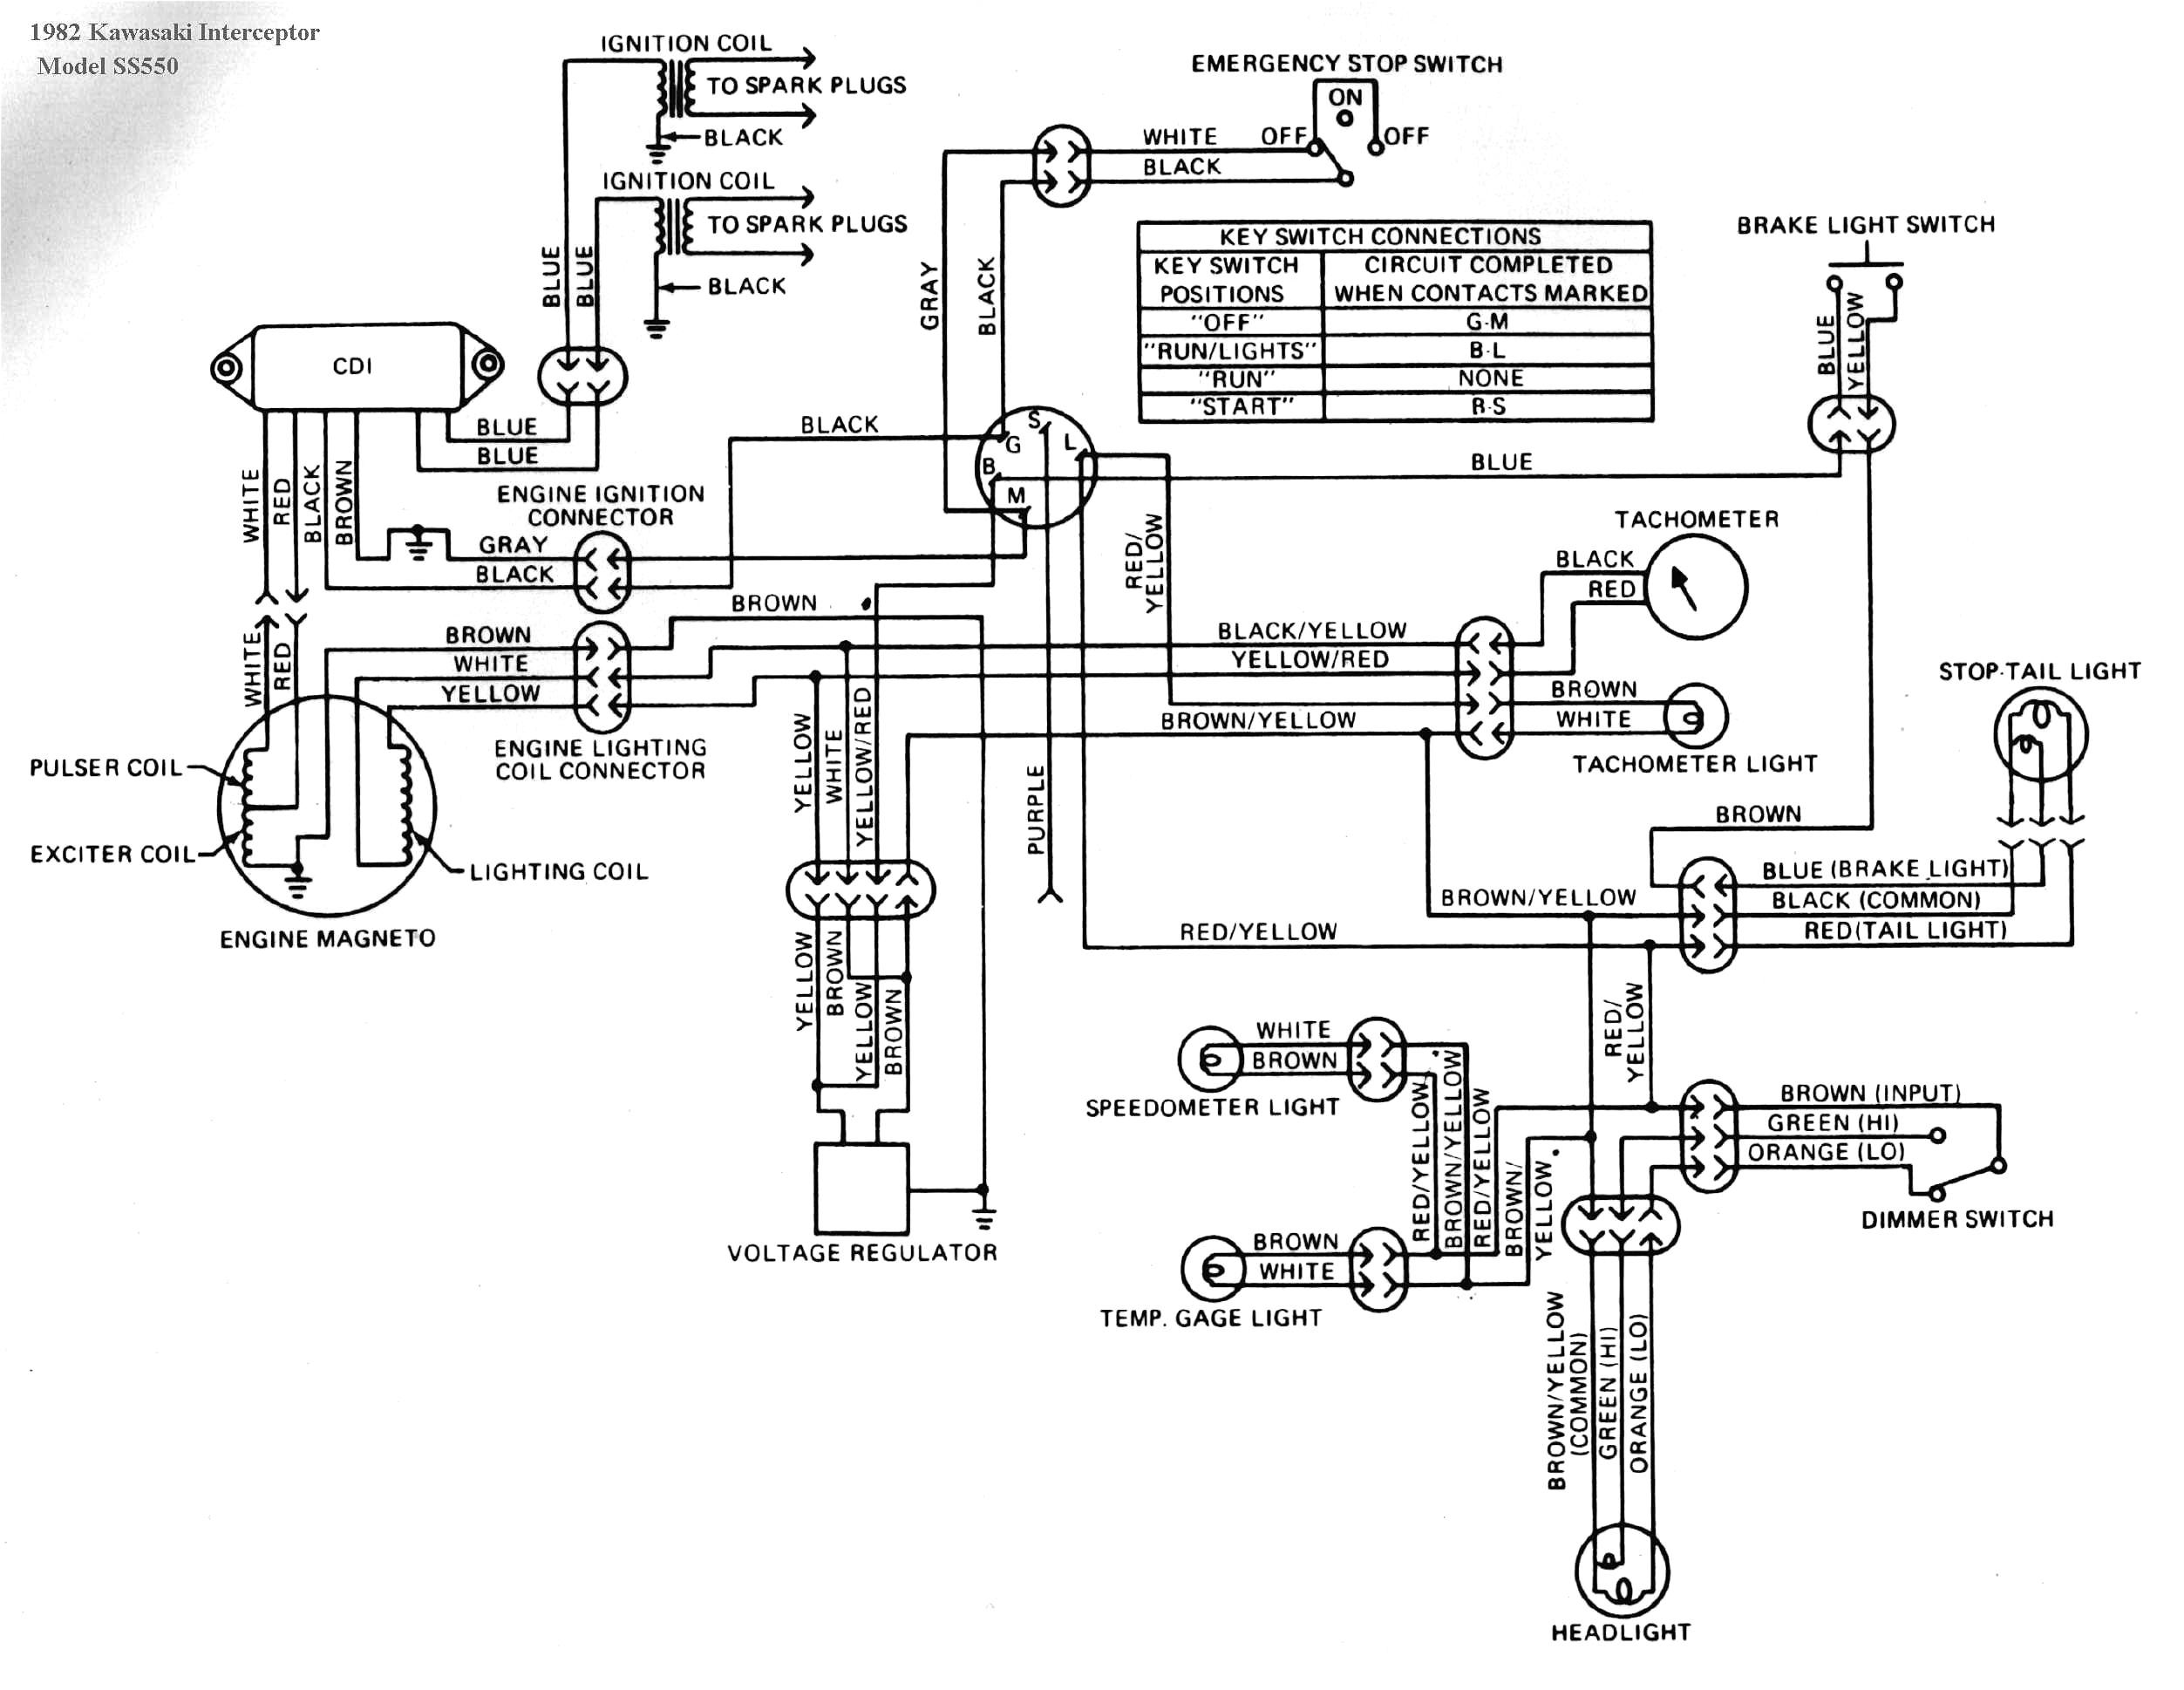 wiring diagram kawasaki jet ski wiring diagram article review